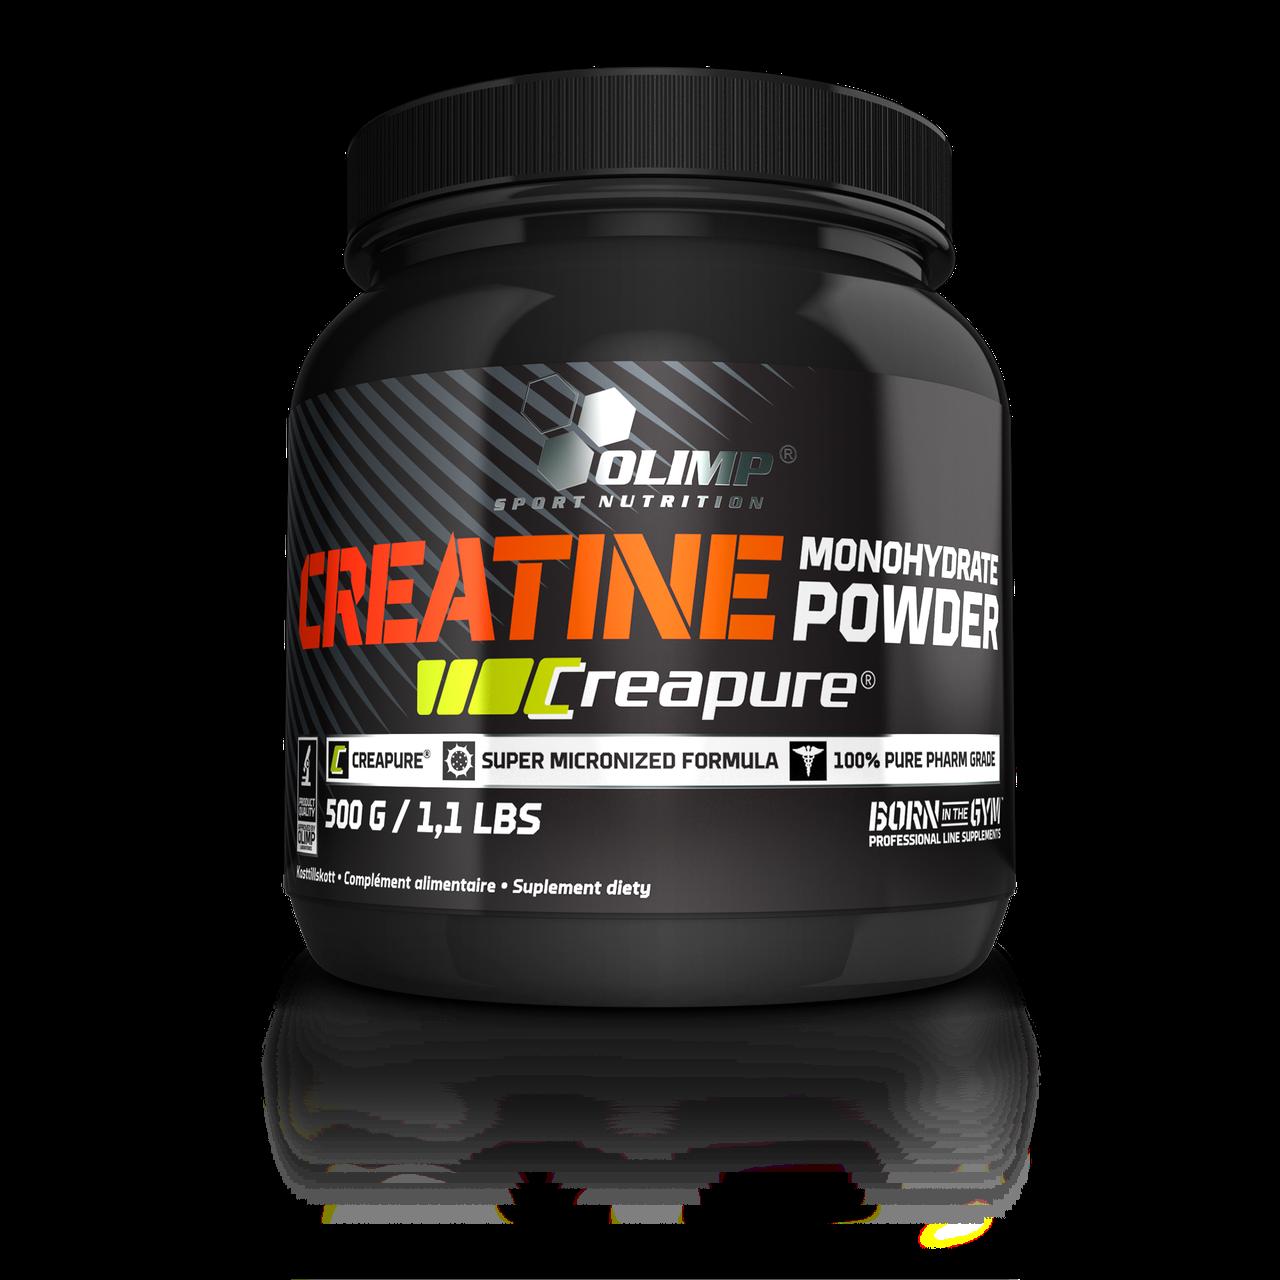 Креатин OLIMP Creatine Monohydrate Powder Creapure 500 g